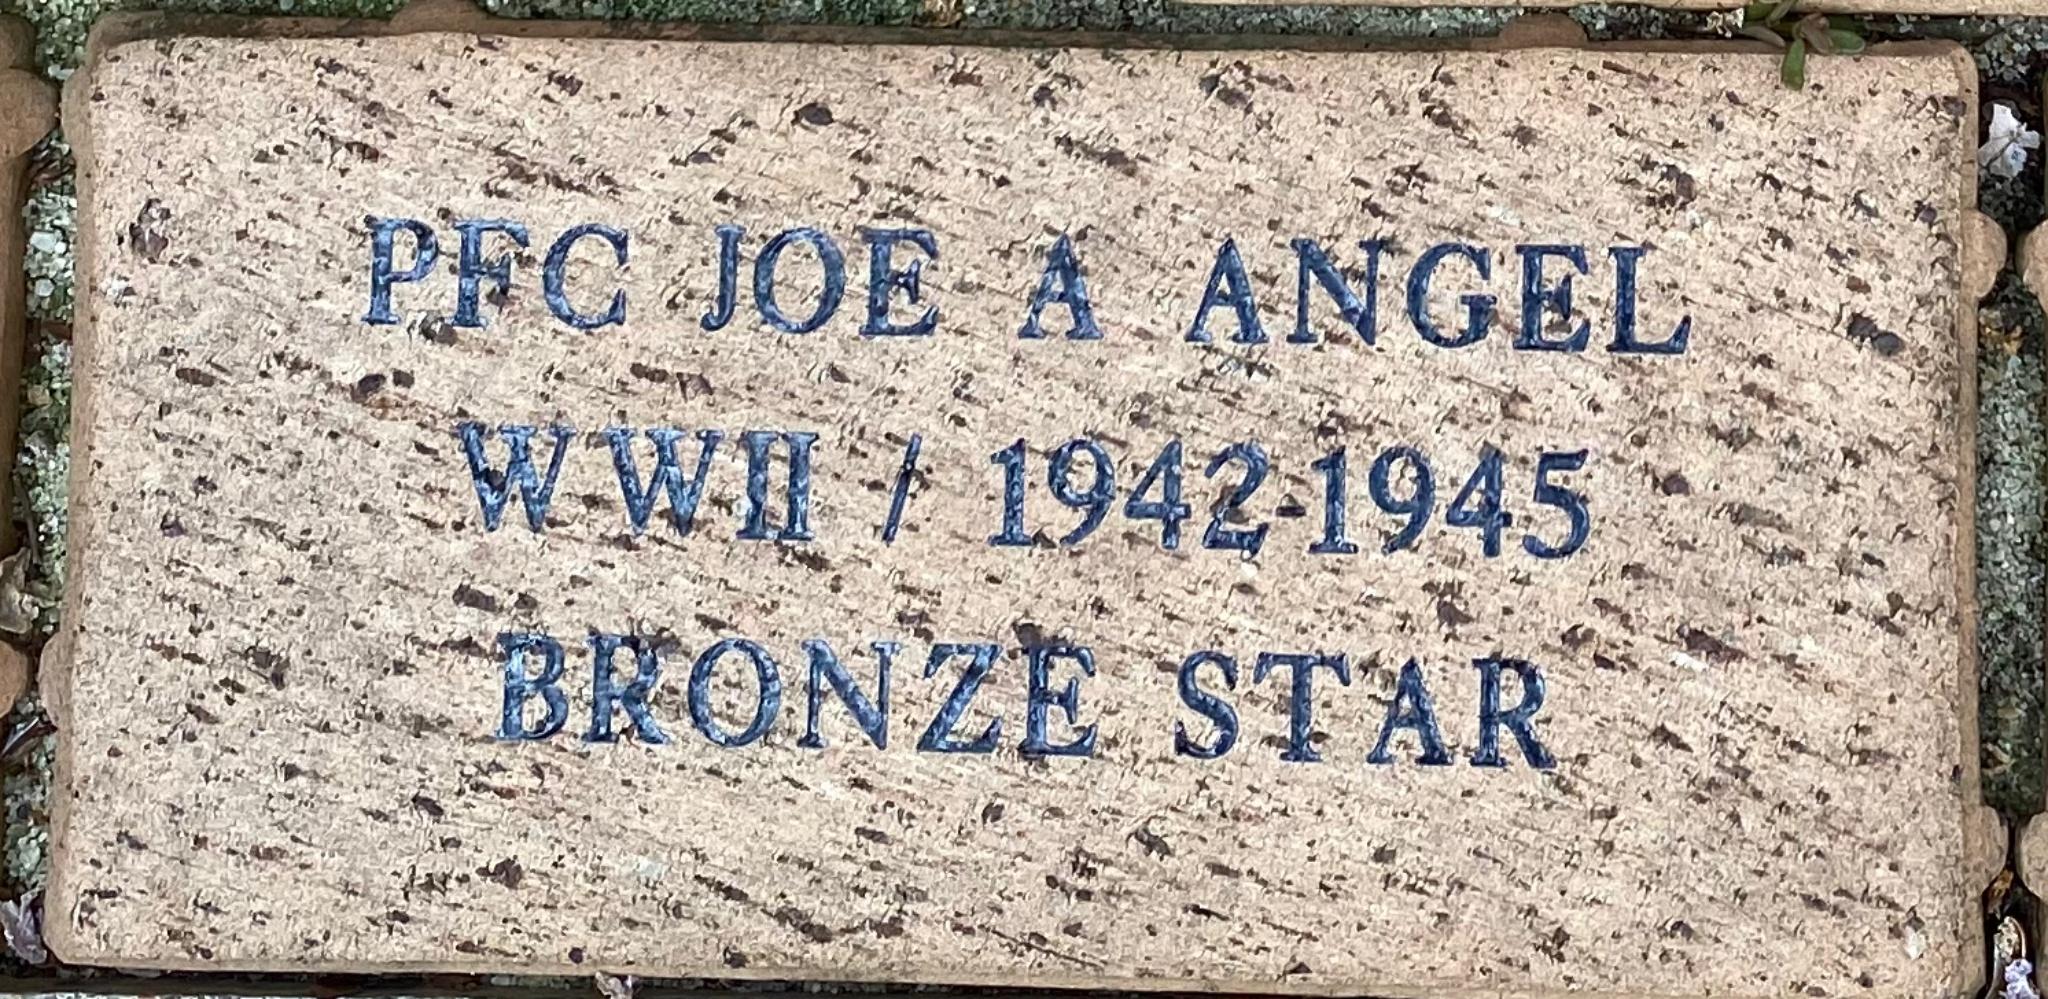 PFC JOE A ANGEL WWII / 1942-1945 BRONZE STAR